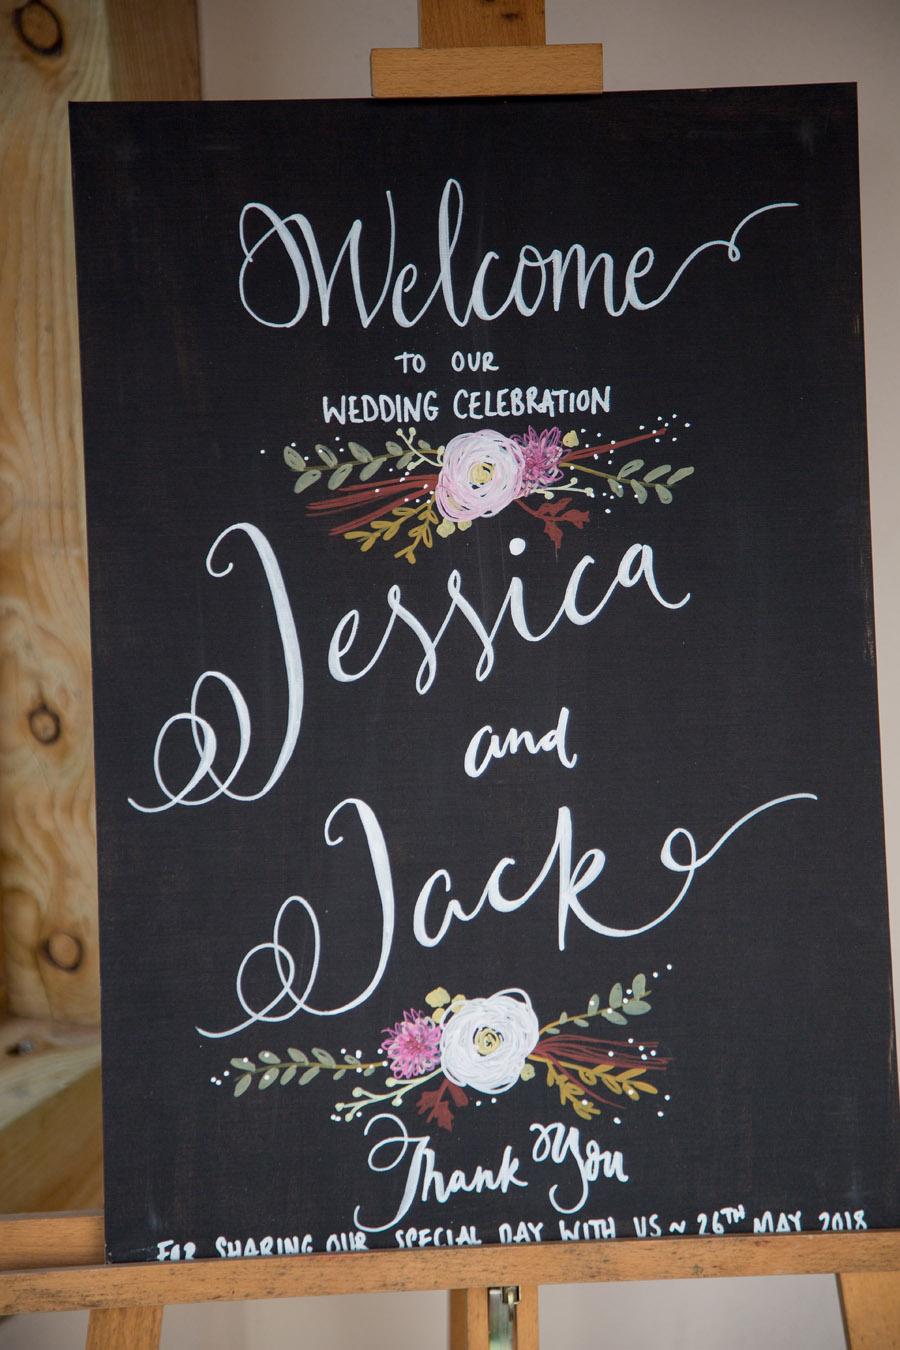 Quantock Lakes wedding styling ideas real wedding photographer Martin Dabek on the English Wedding Blog (4)